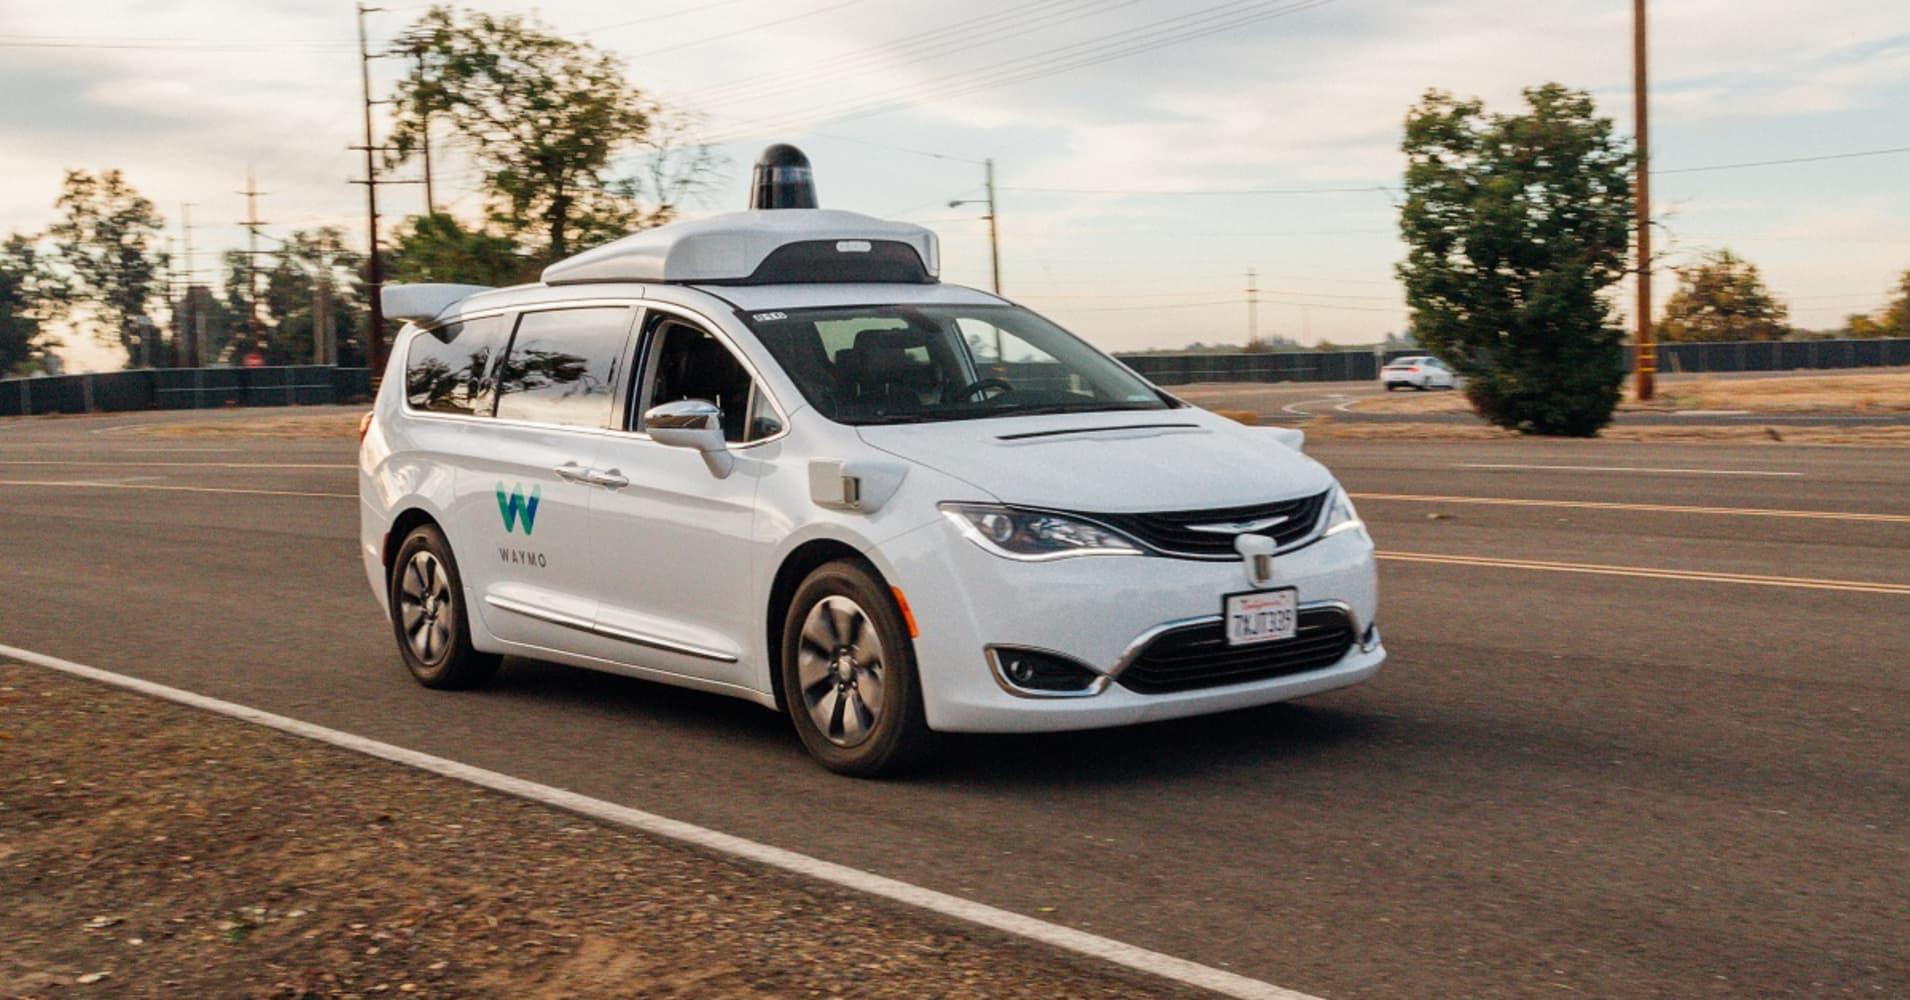 AutoNation to service Waymo self-driving vehicles